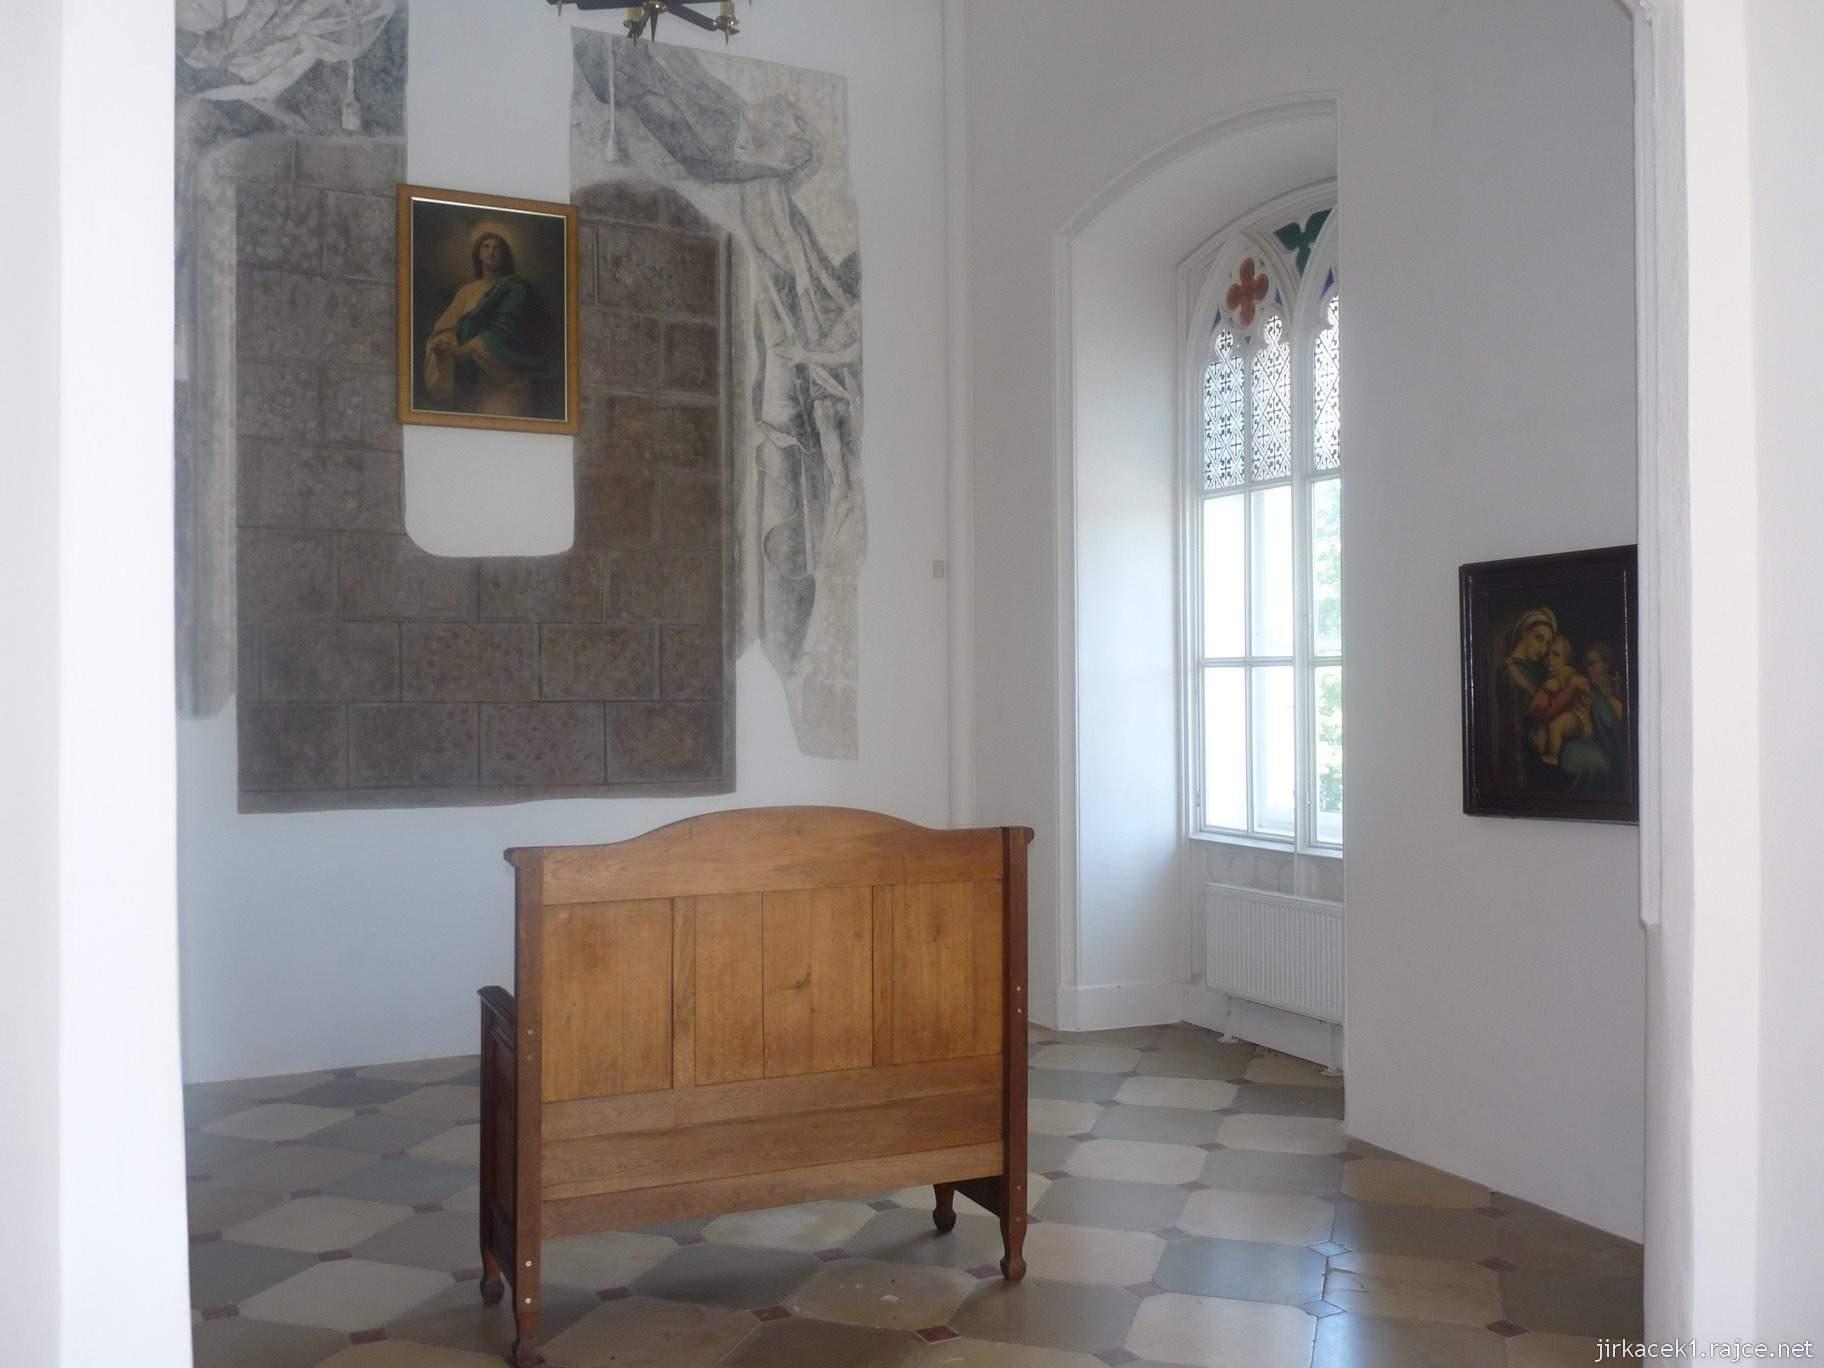 Napajedla - zámek 22 - kaple